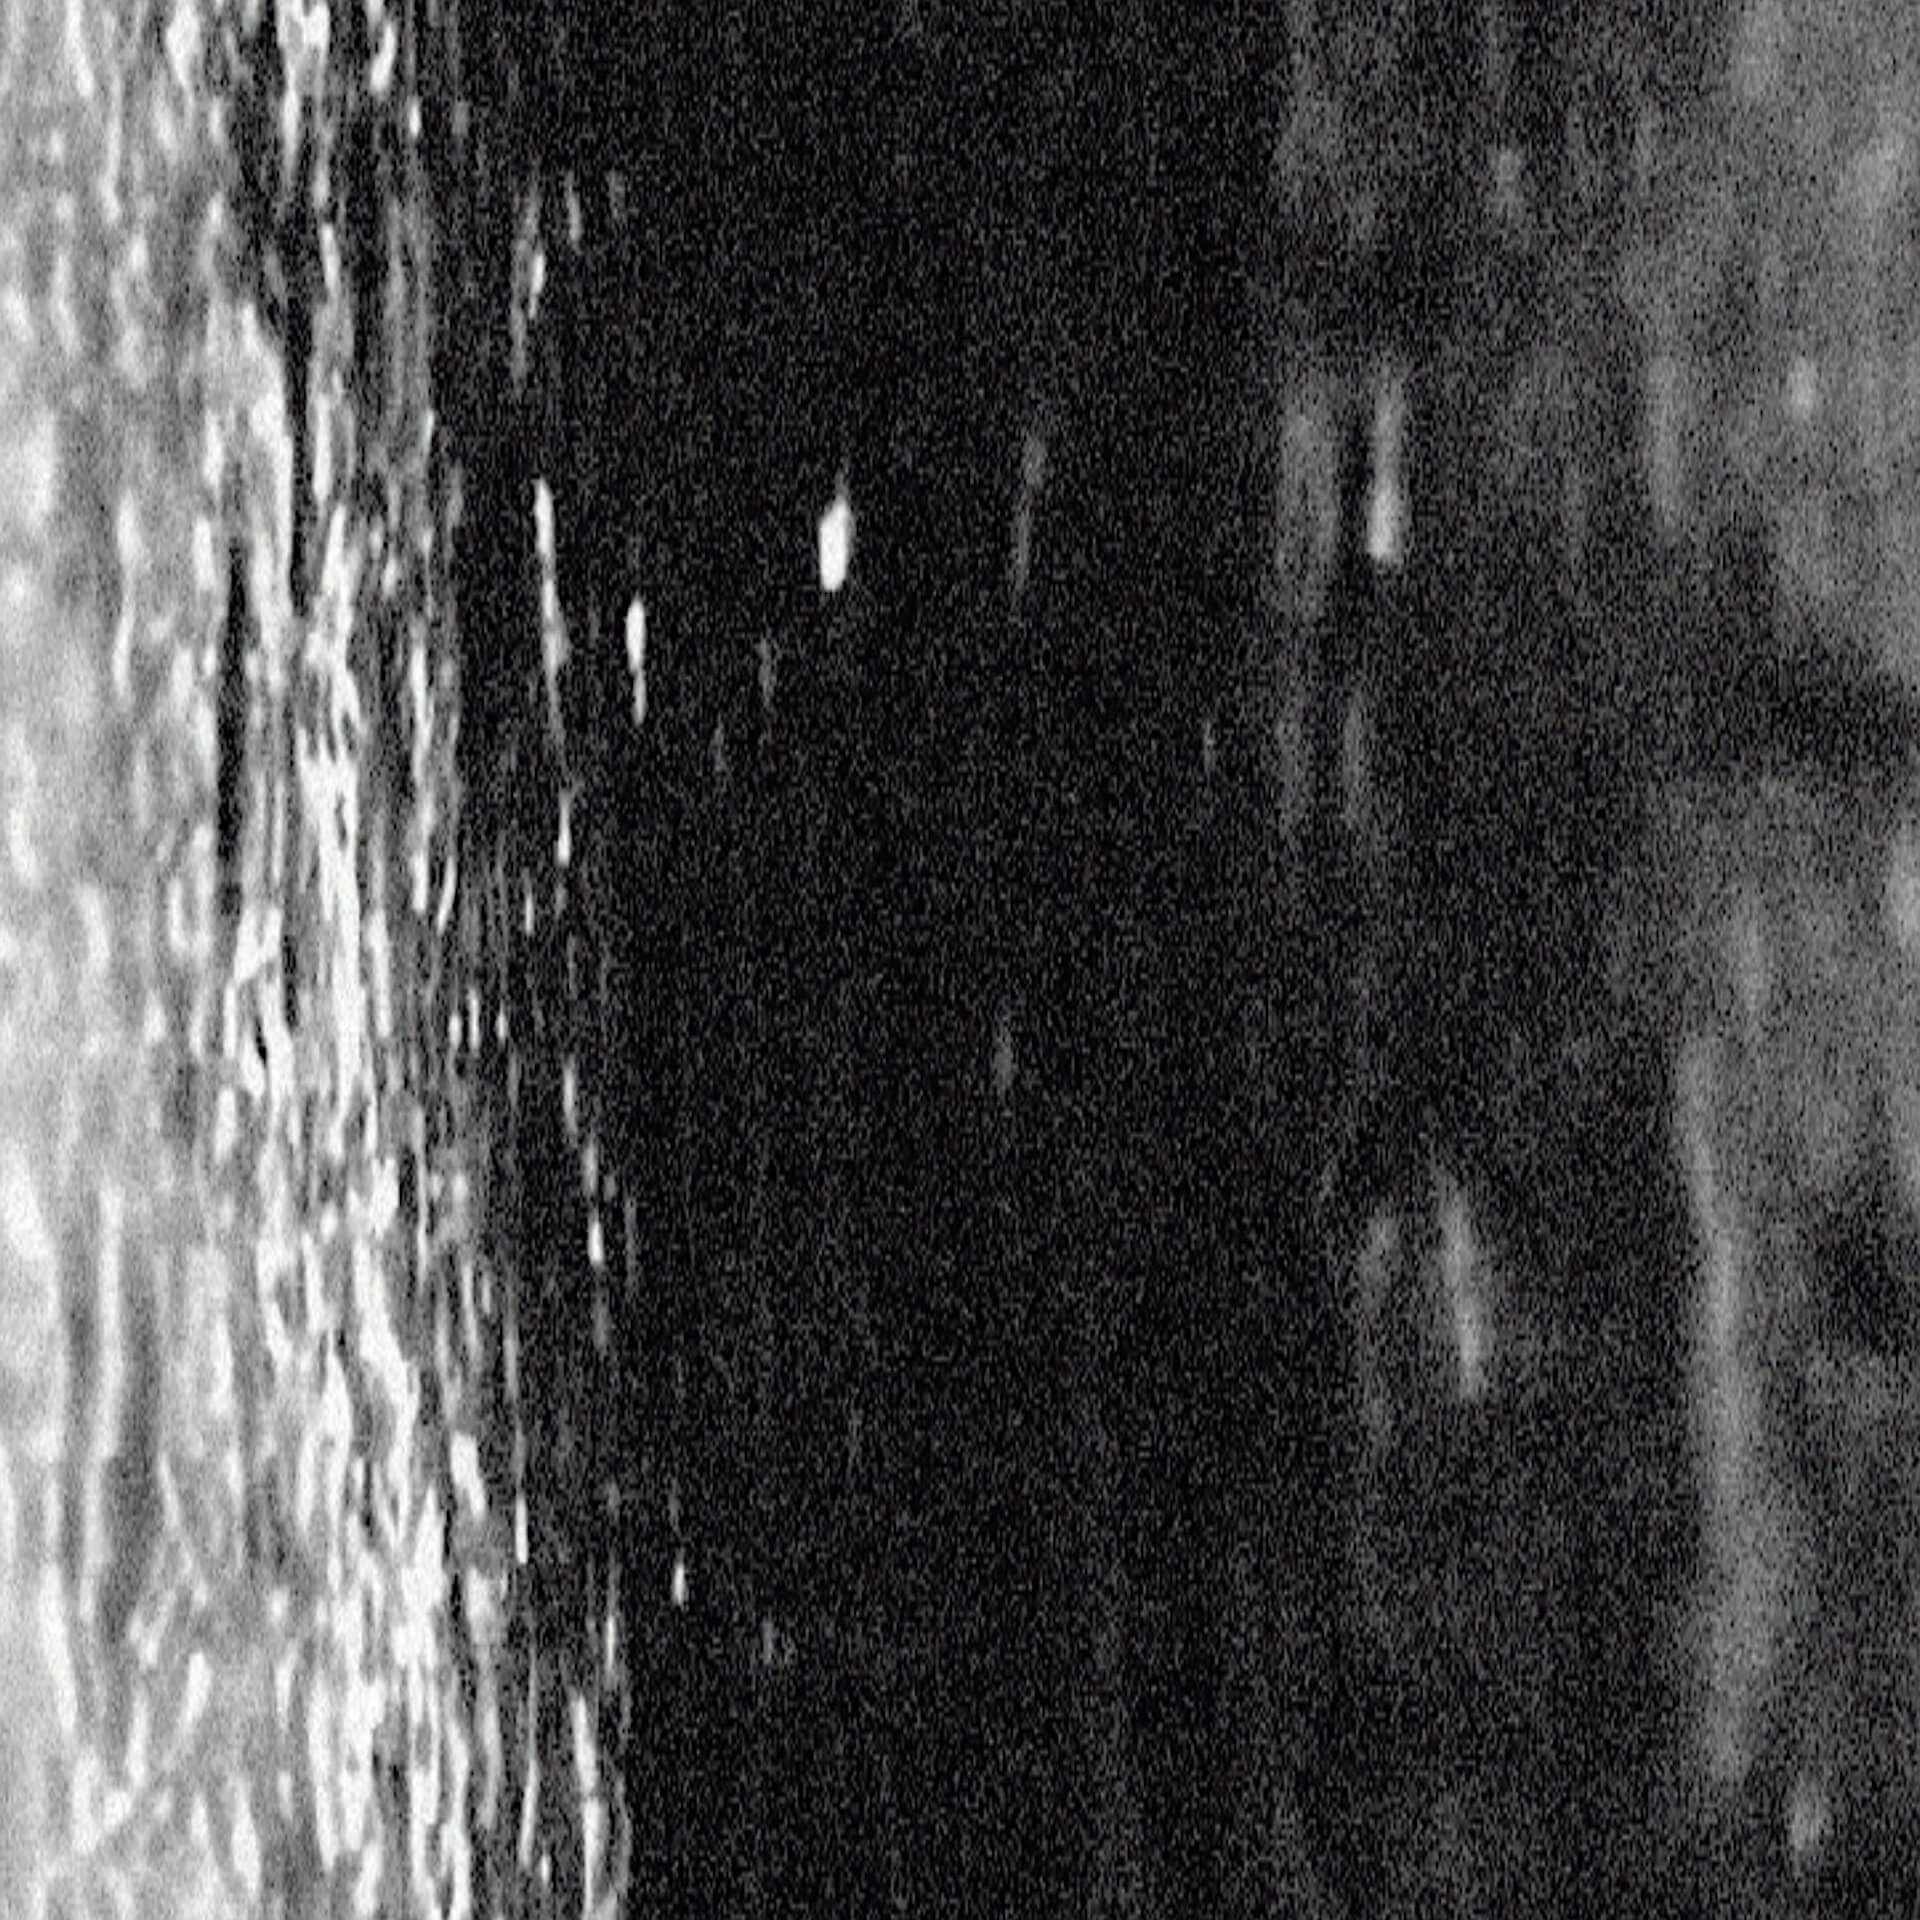 5lack、2019年初となるシングル「Grind the Brain」をリリース|ISSUGI、PUNPEE、GAPPER、kZmらが登場するMVも公開 music190703-5lack-grind-the-brain-2